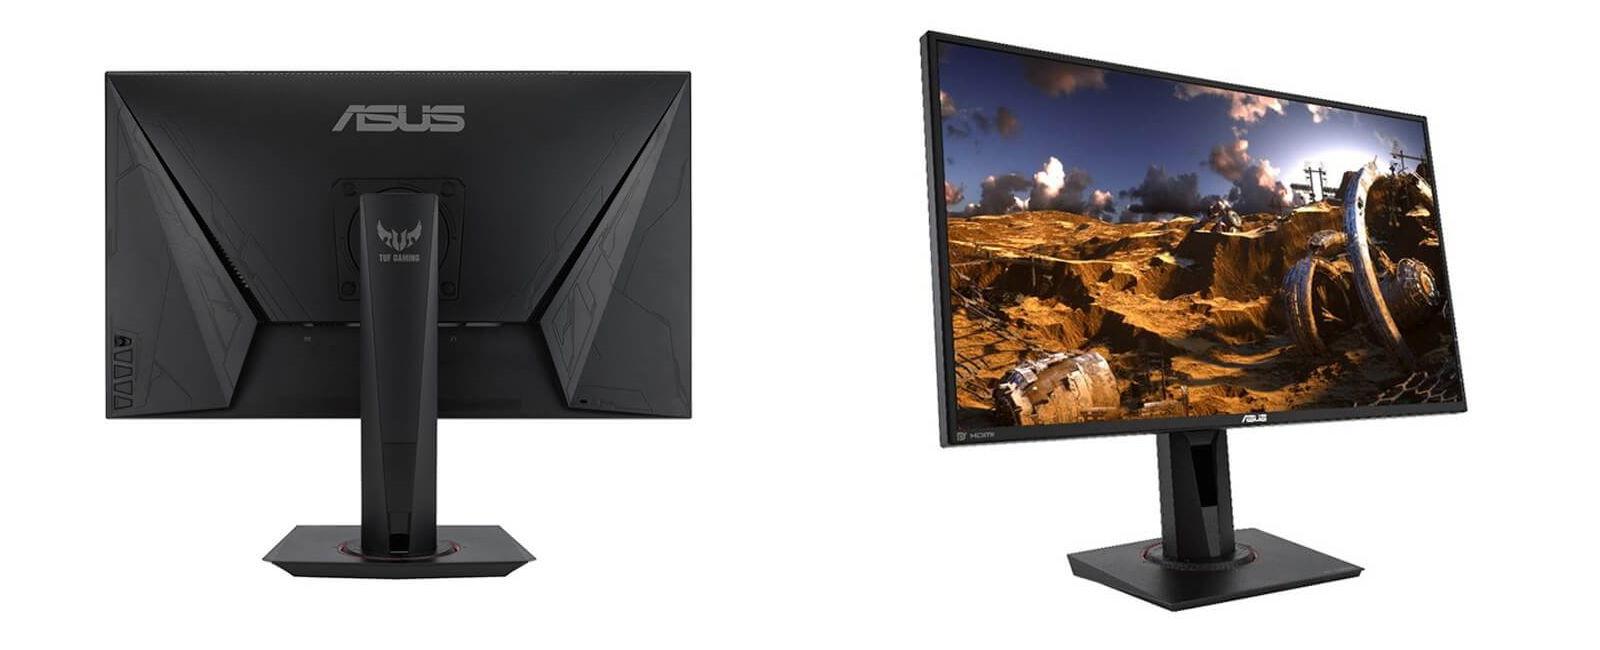 Asus TUF Gaming VG279QM monitor 280 Hz